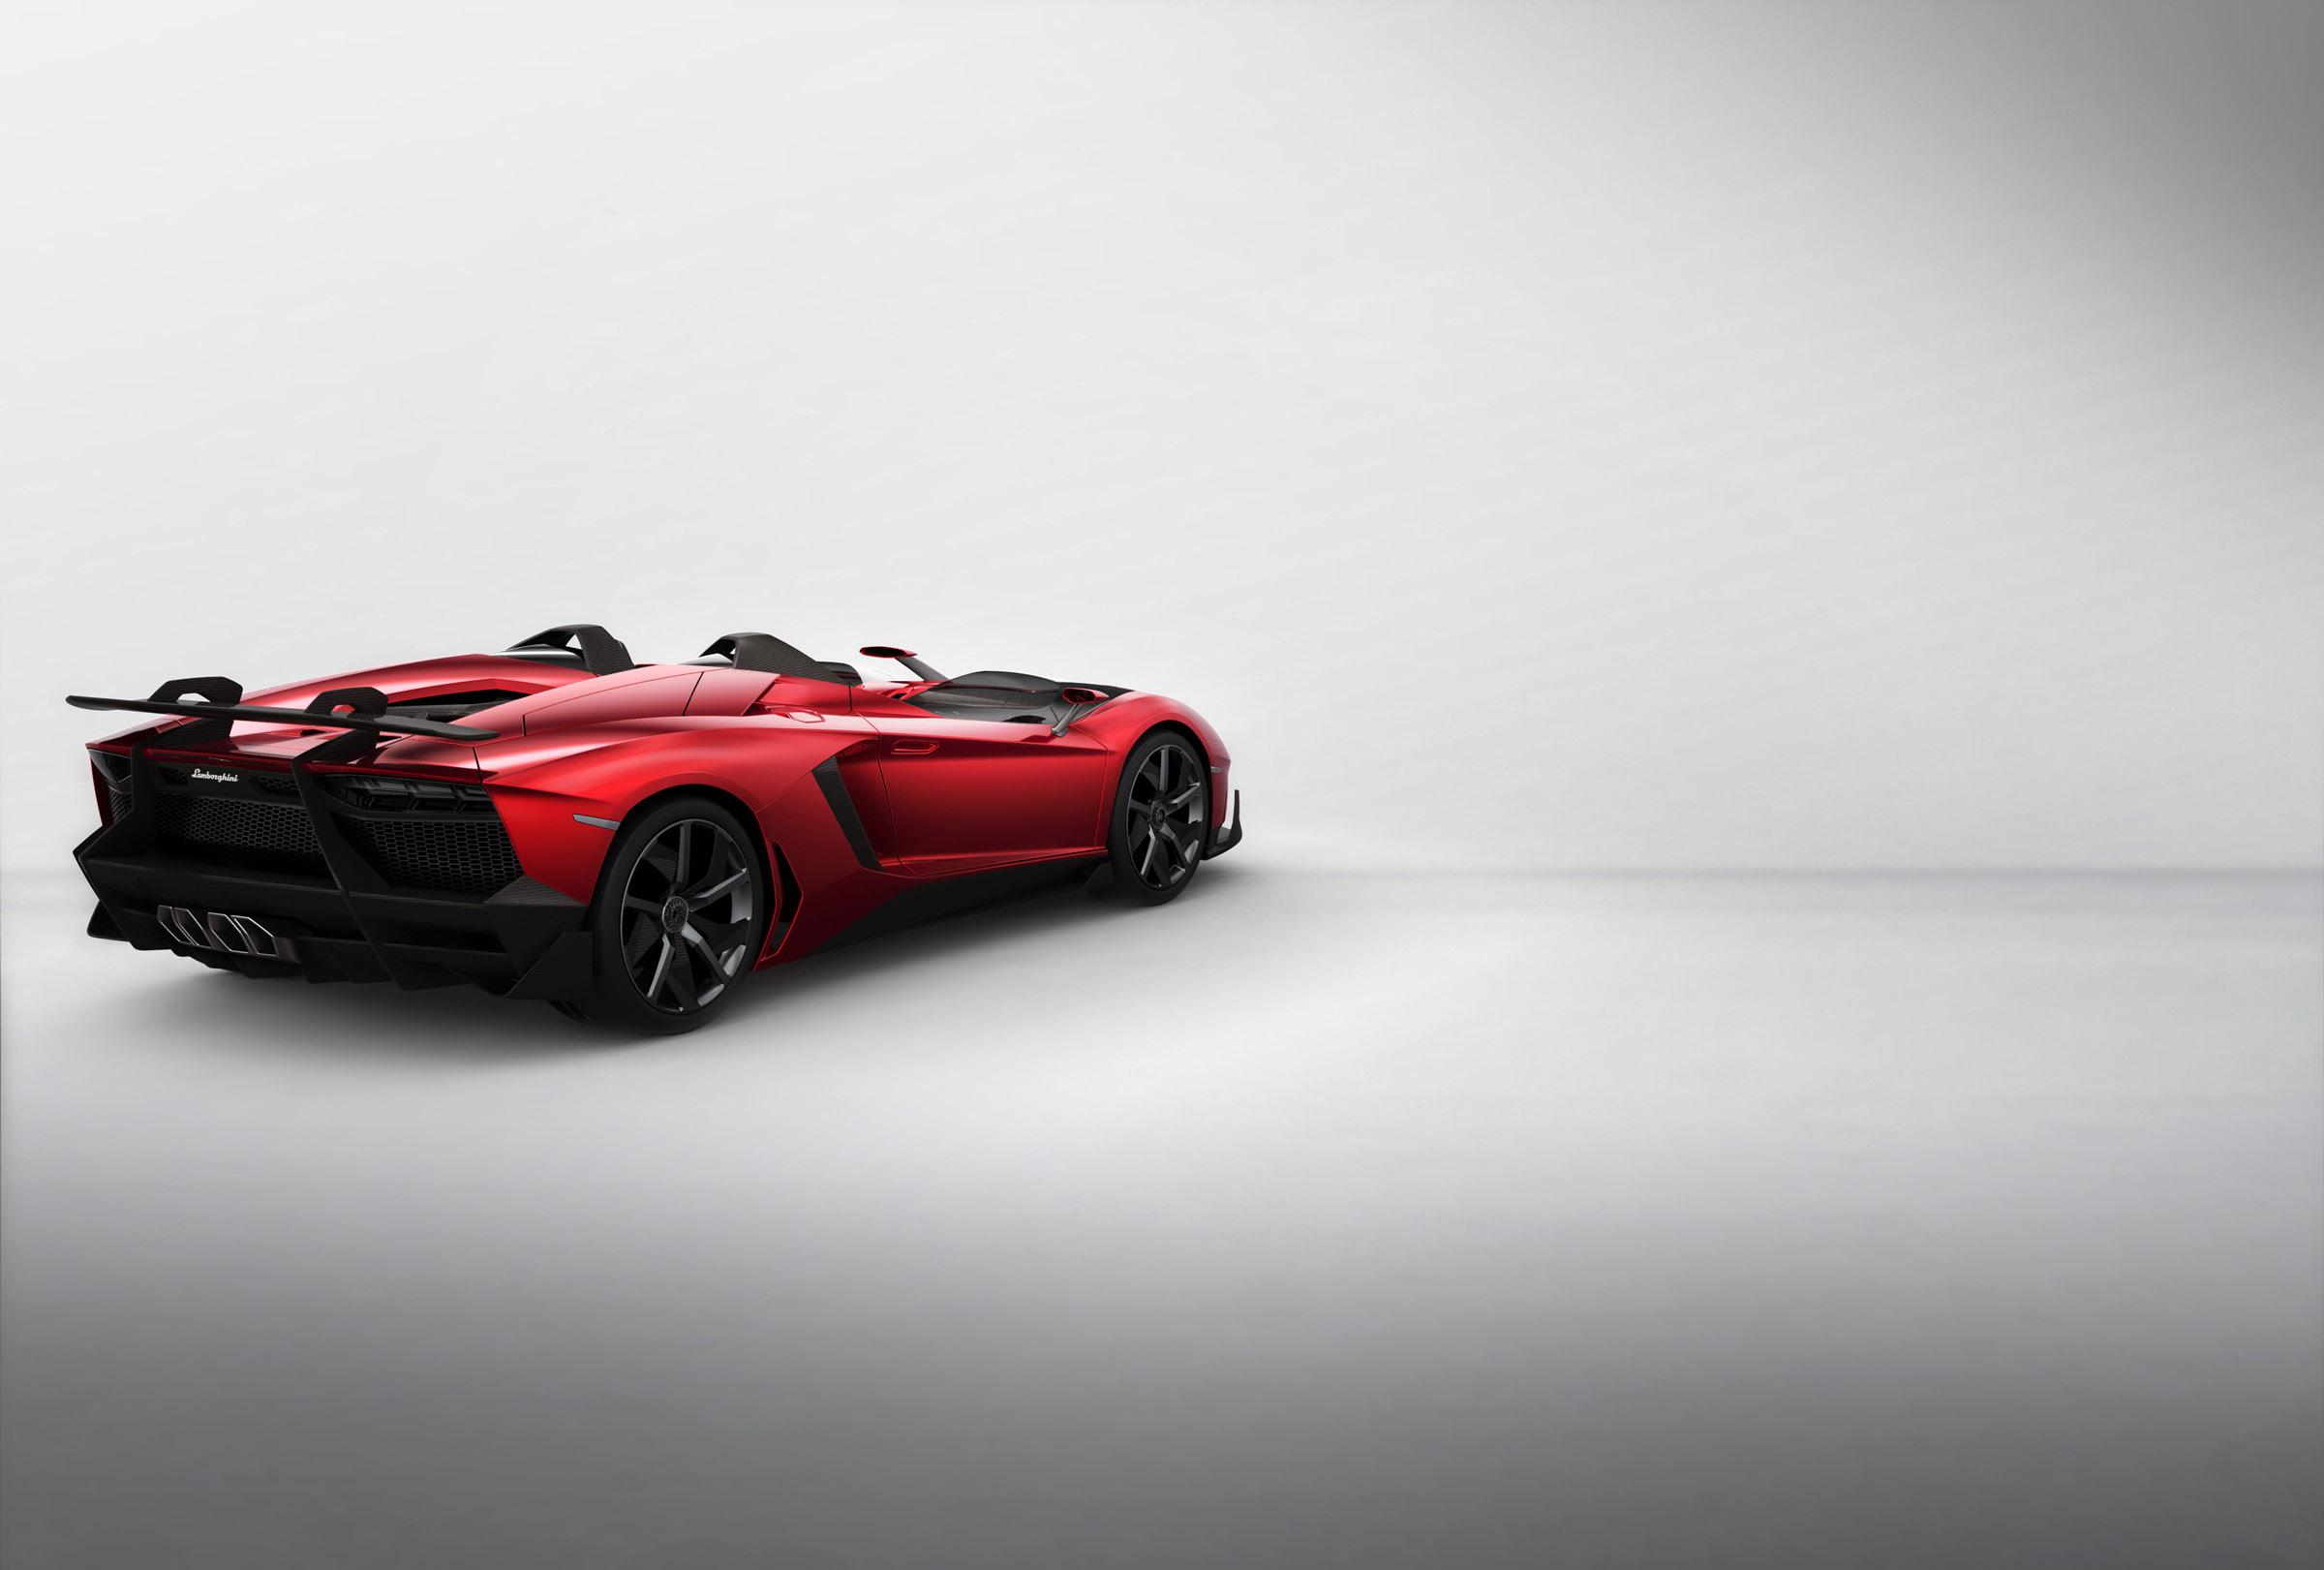 Lamborghini Aventador J Выявлено - фотография №16